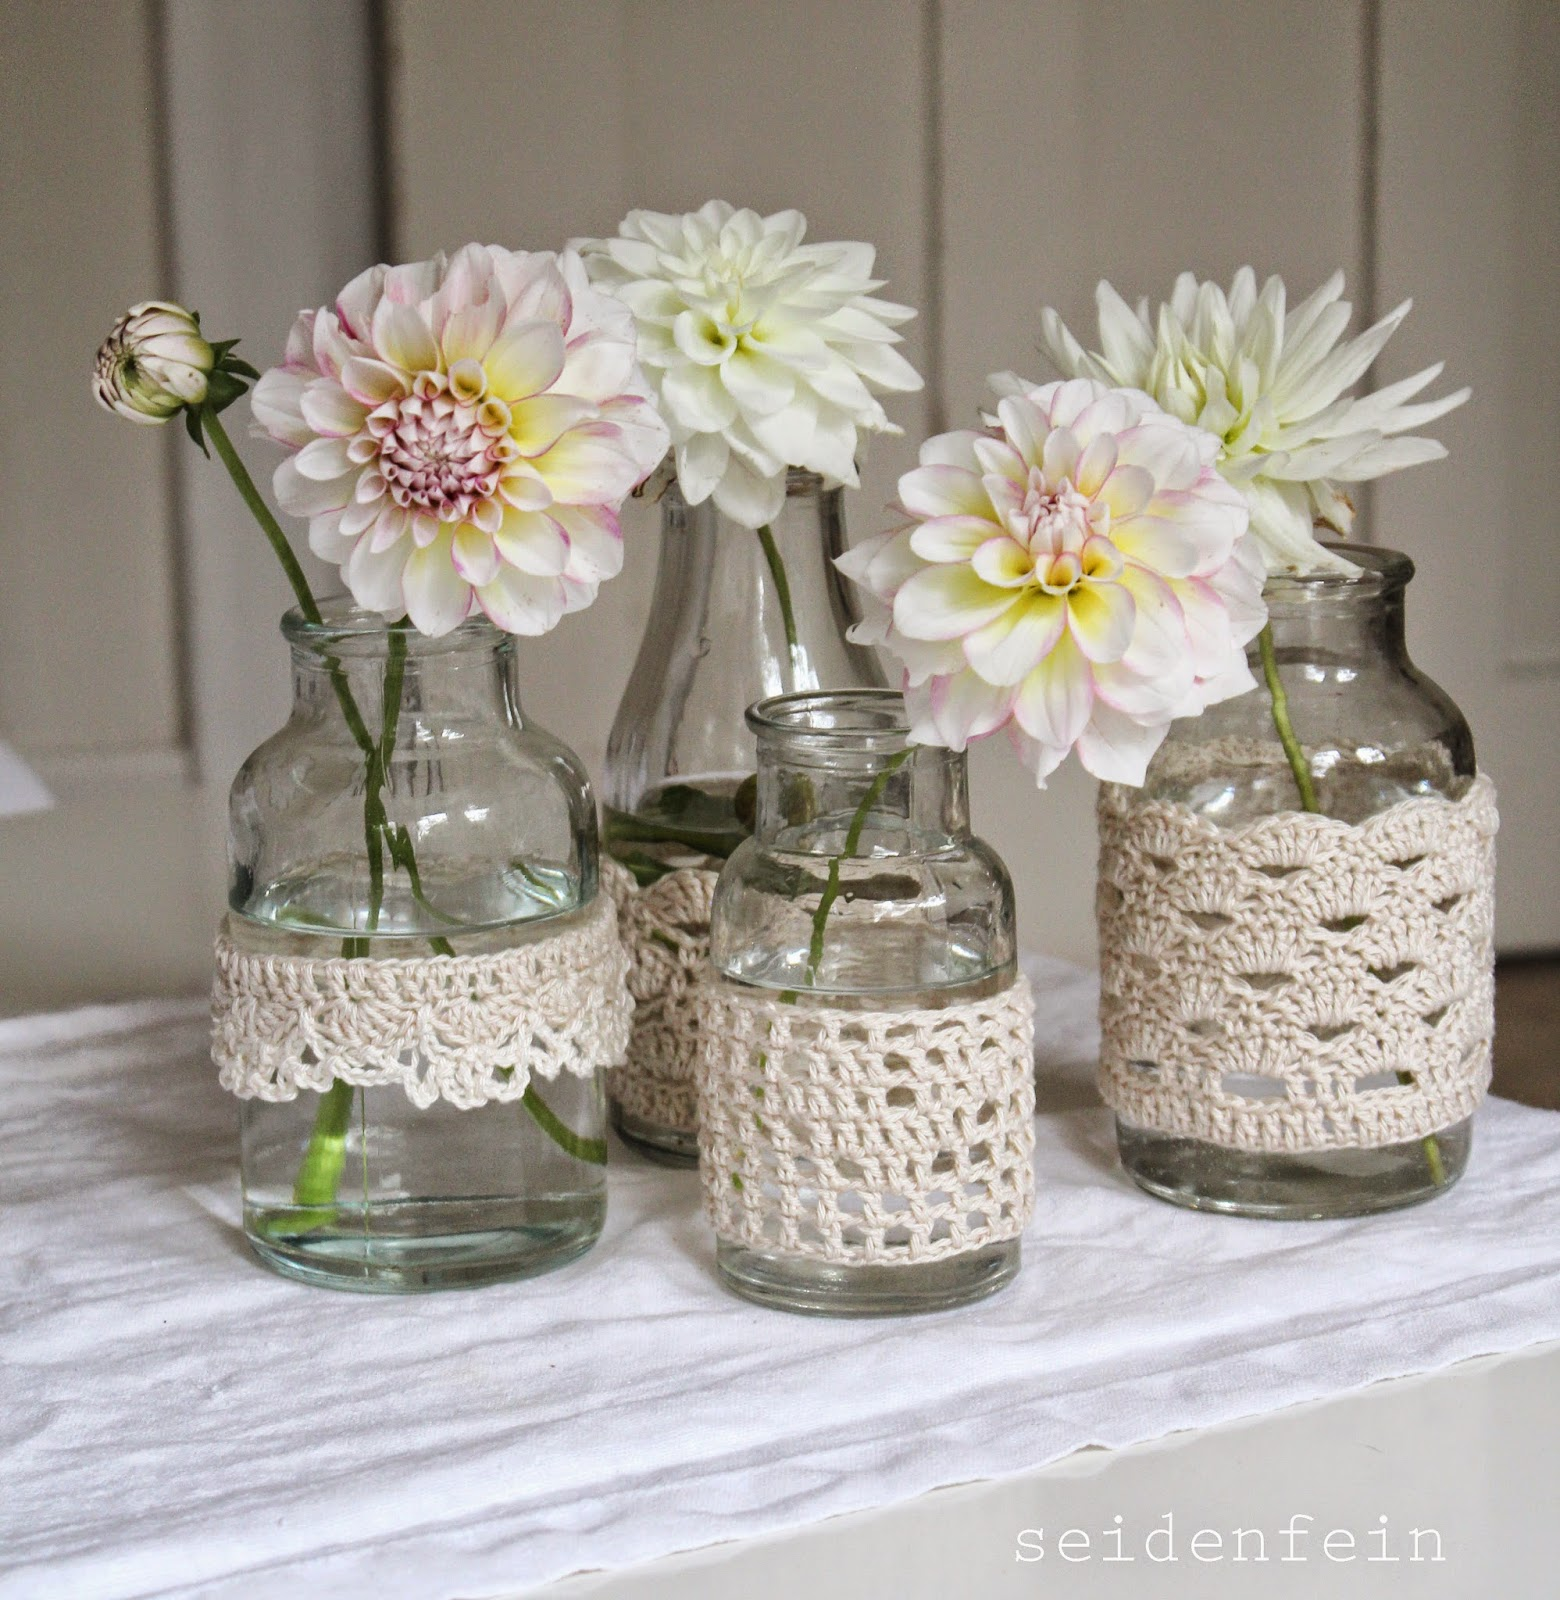 seidenfeins blog vom sch nen landleben zart dahlien in beh keltem glas diy crochet jars. Black Bedroom Furniture Sets. Home Design Ideas